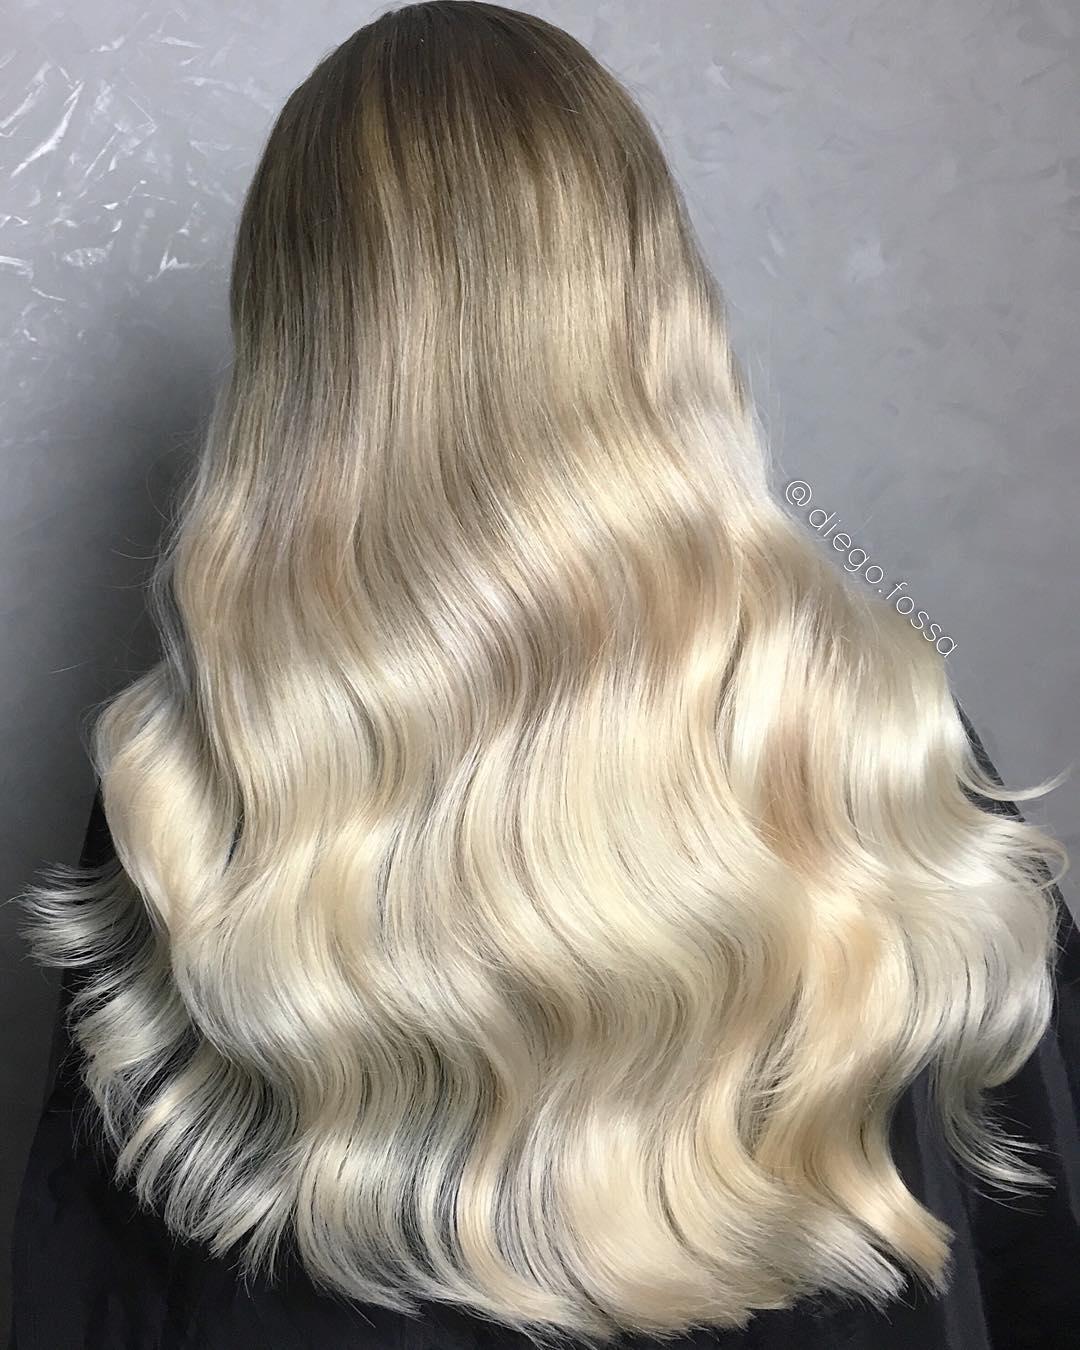 24 Best Hair Colors for Spring-Summer Season 2019